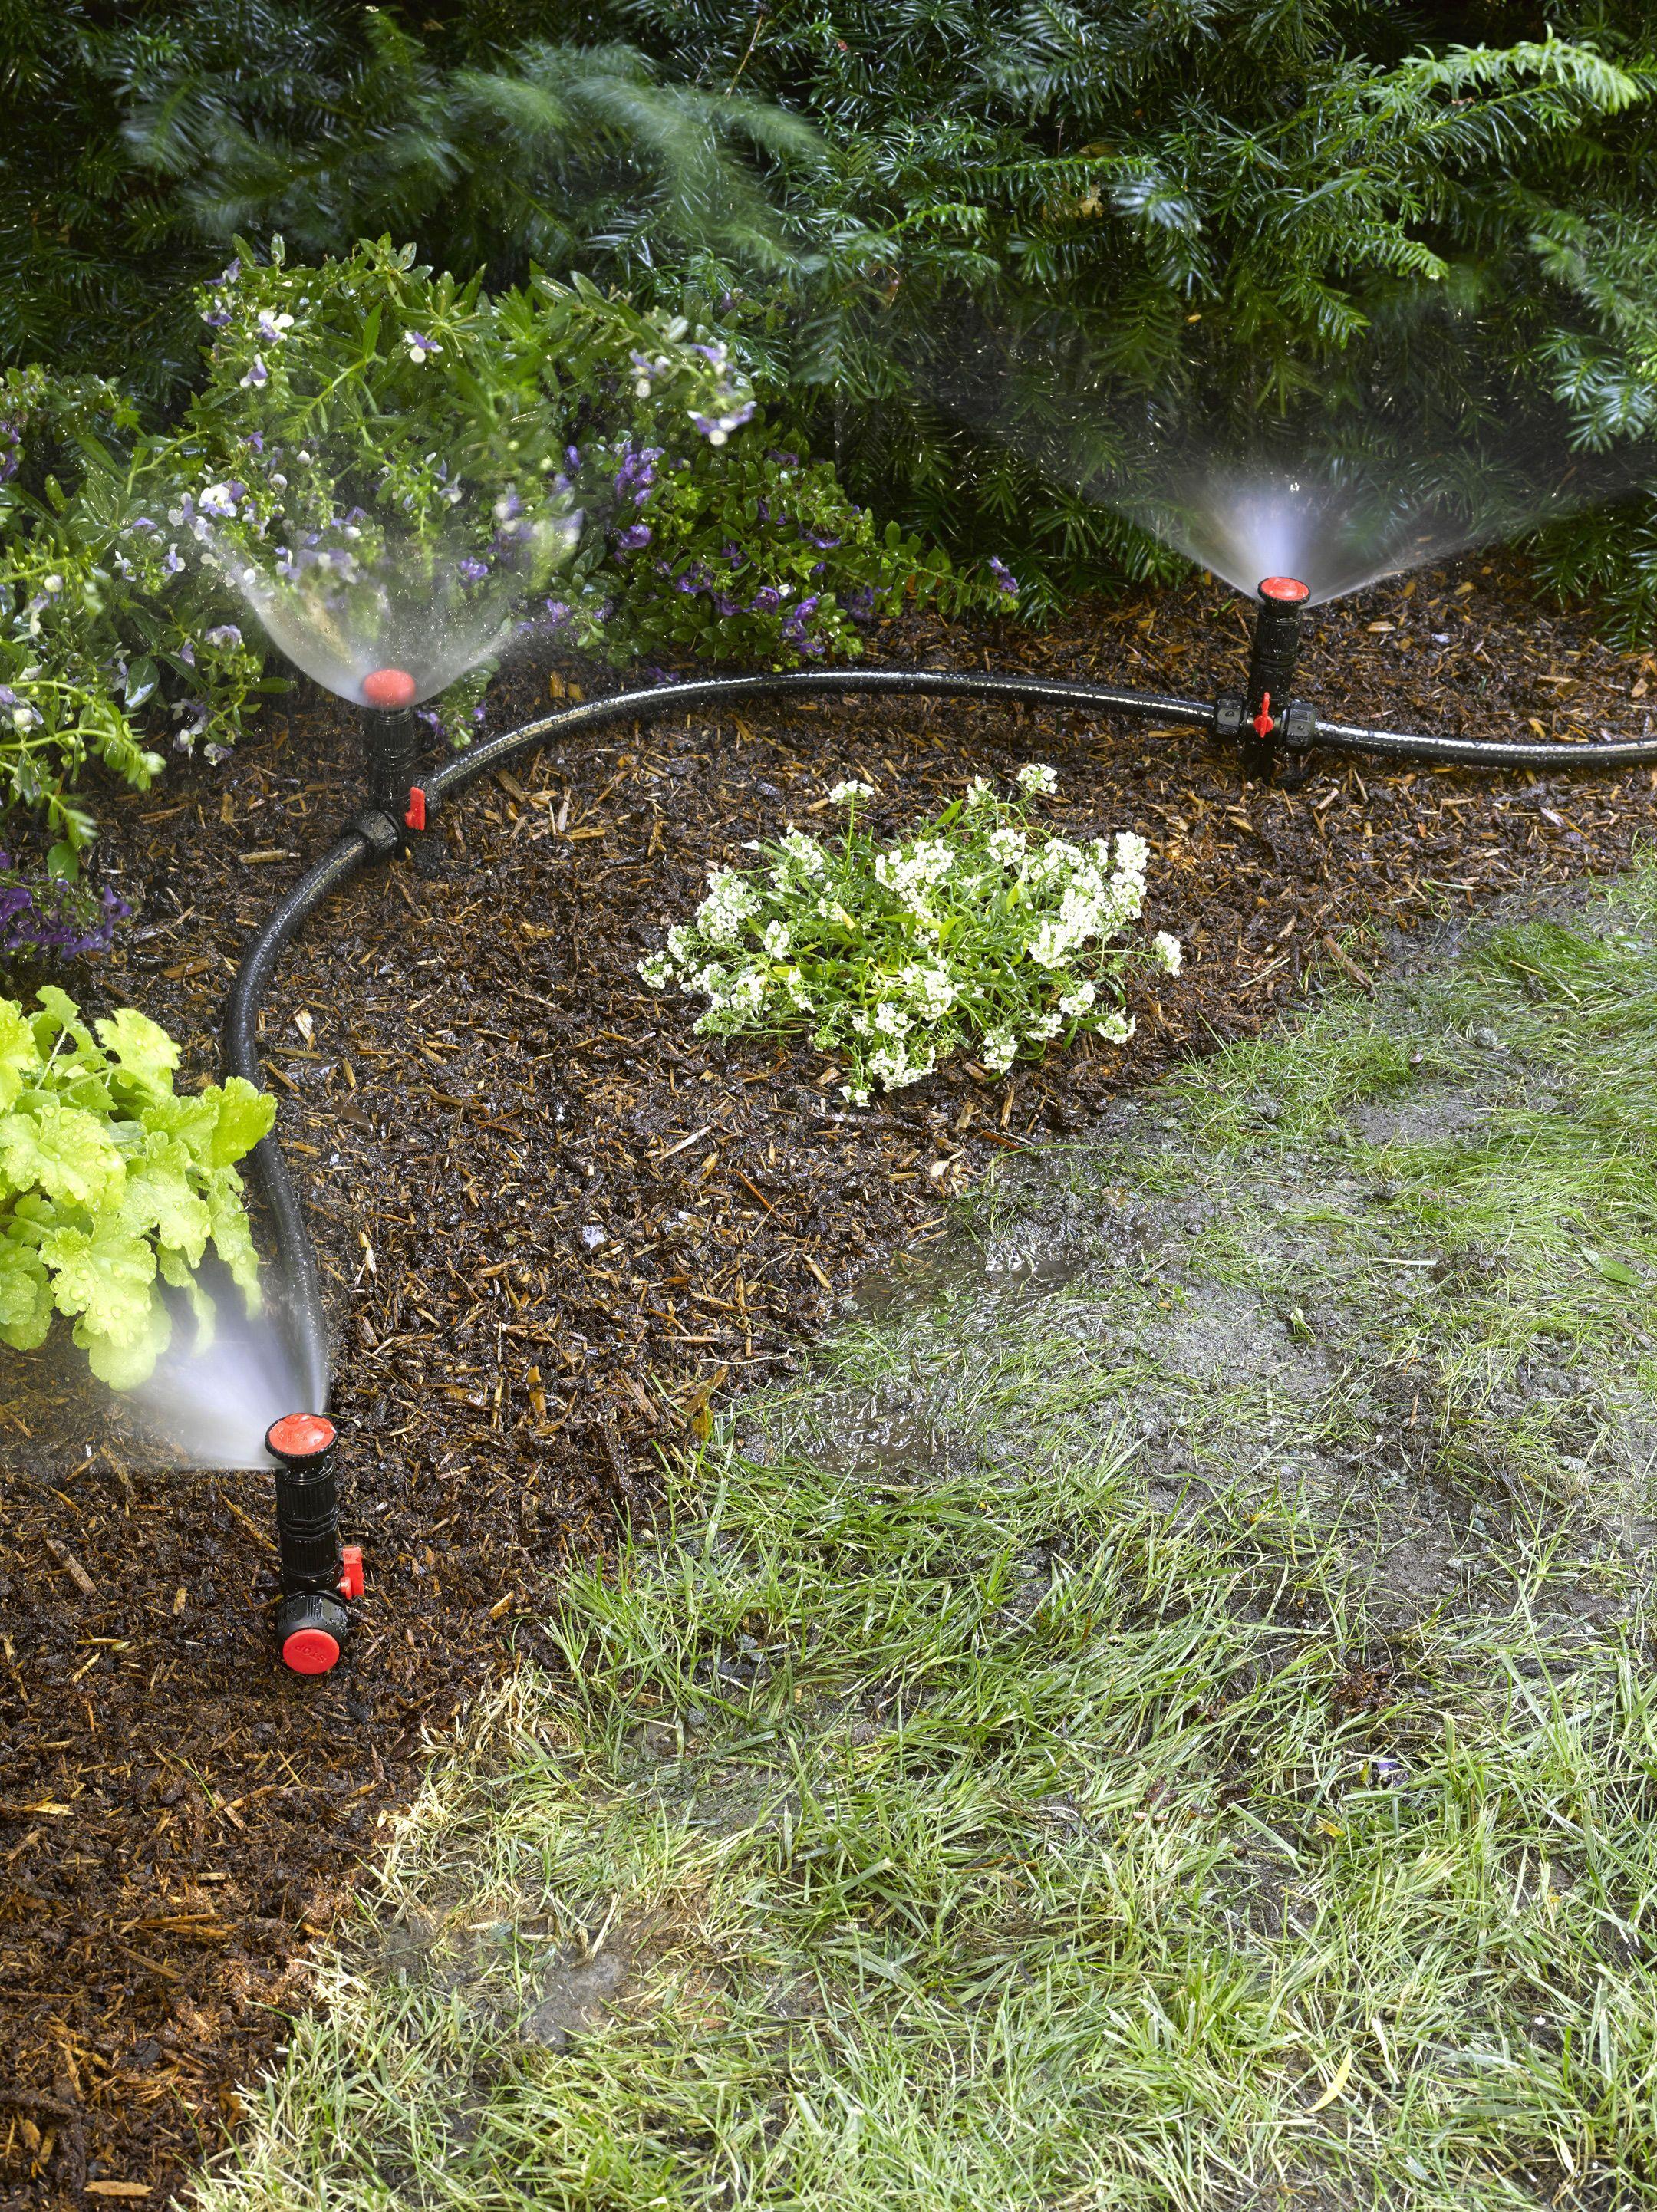 above ground irrigation systems for landscaping diy. Black Bedroom Furniture Sets. Home Design Ideas